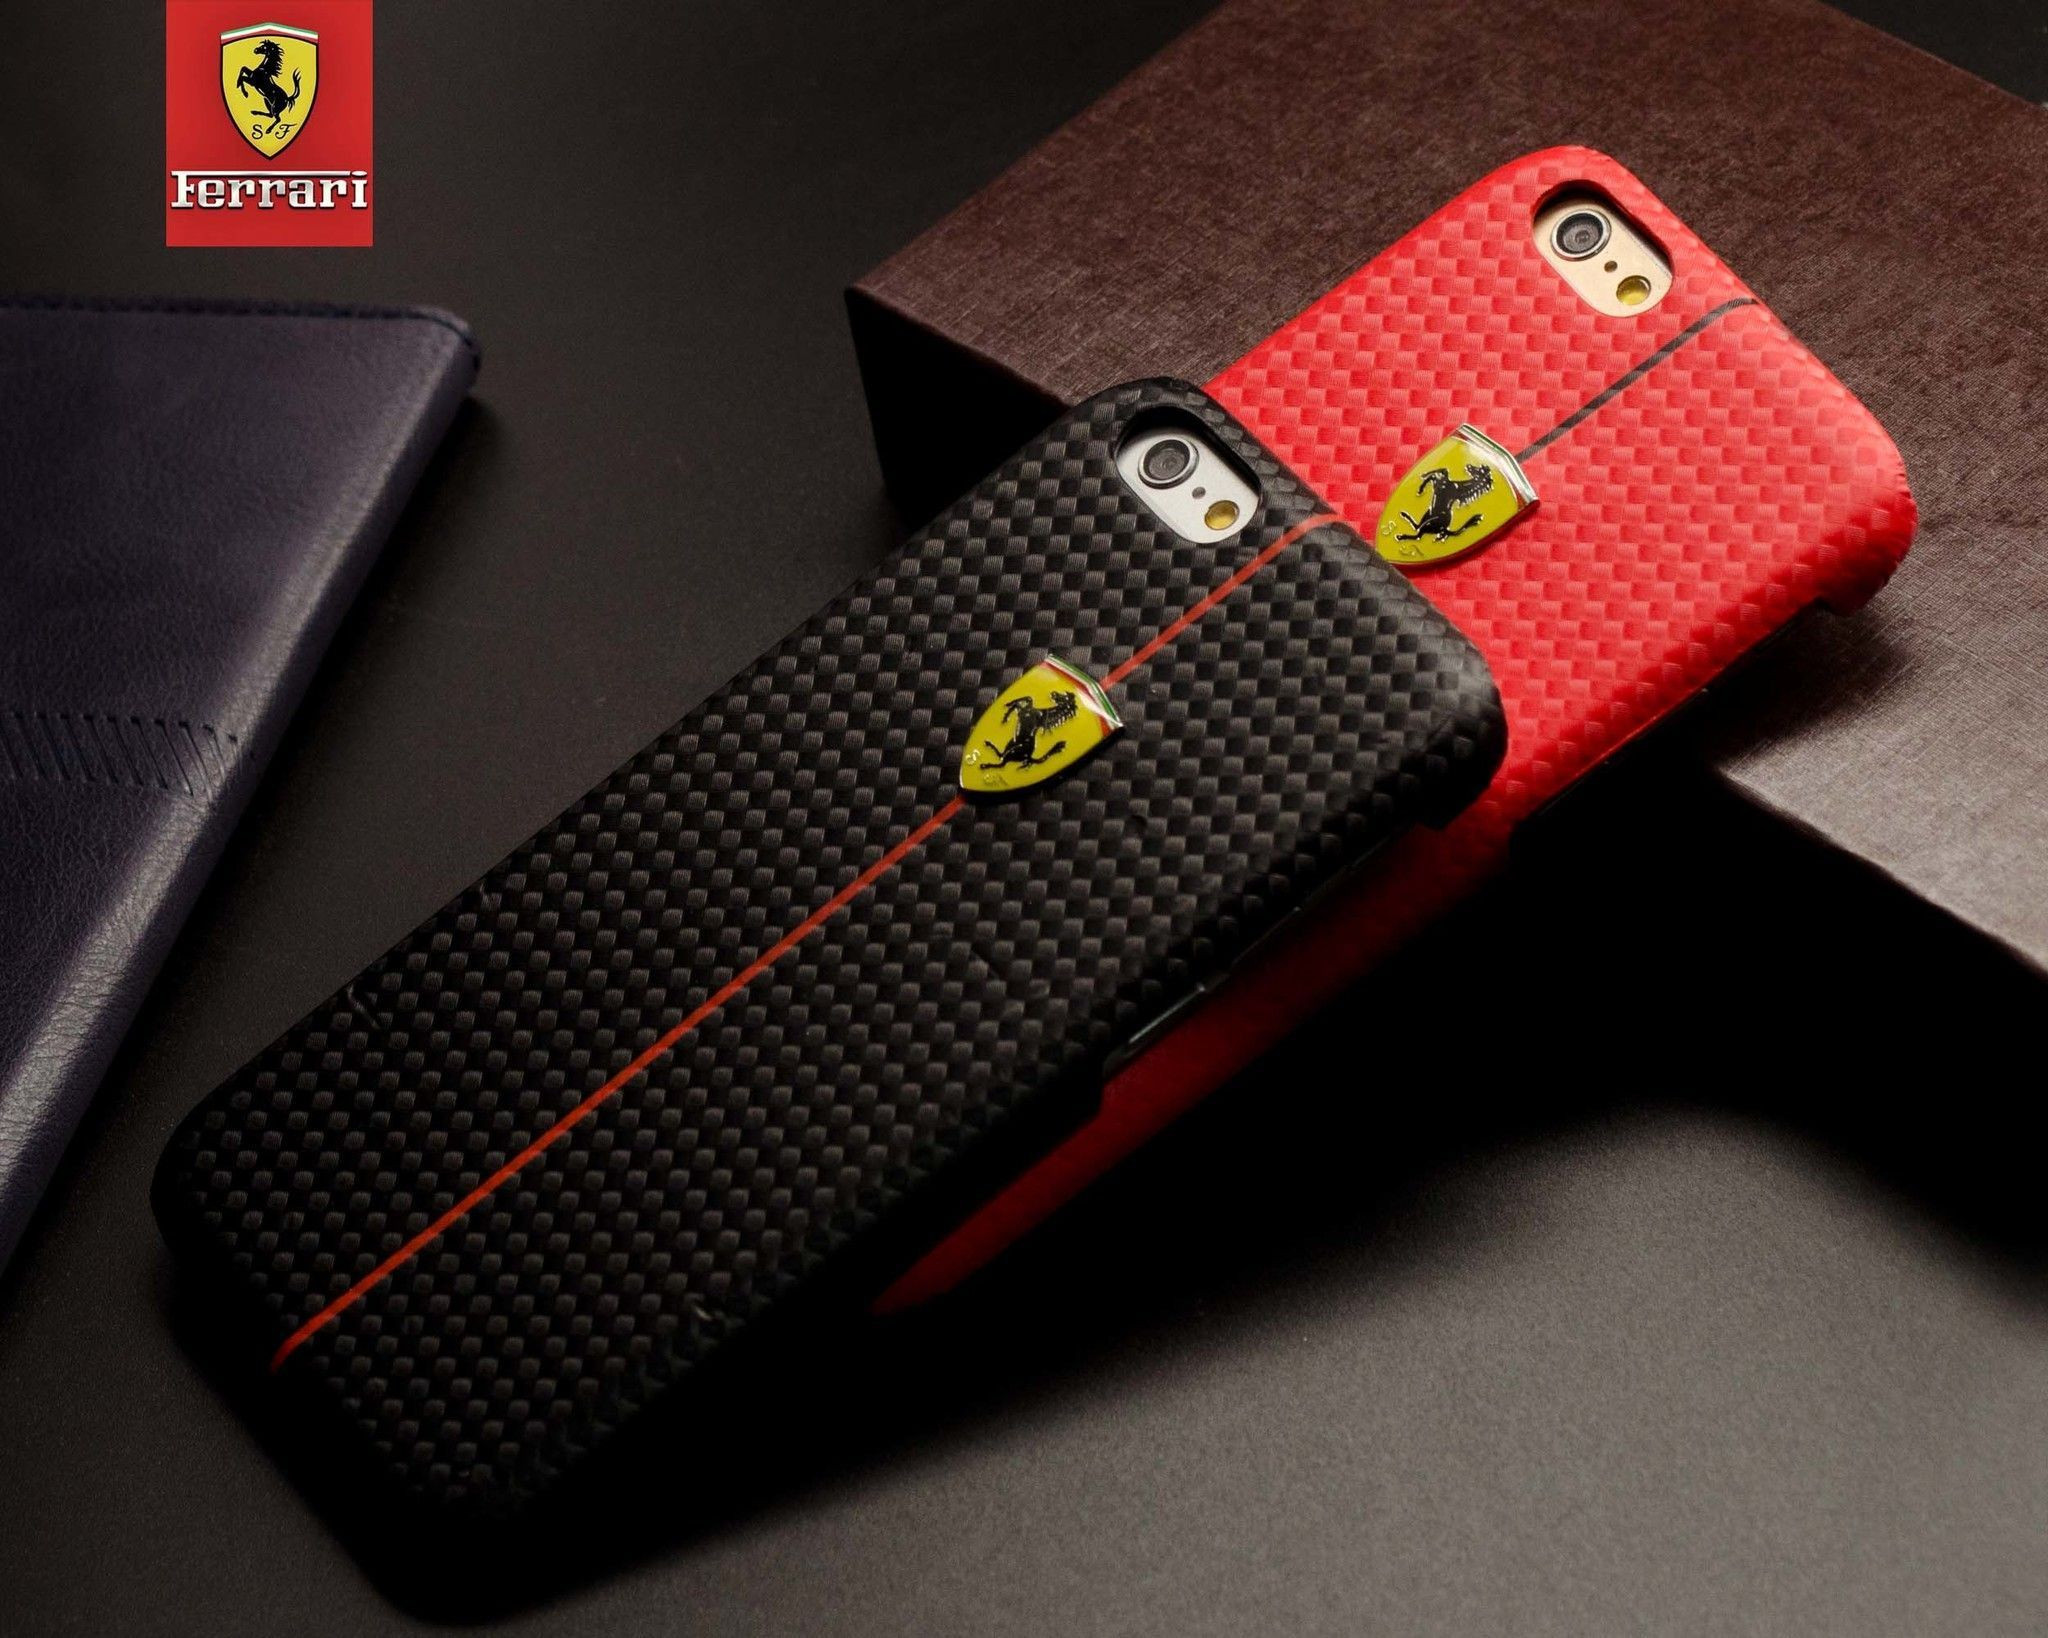 finest selection aa848 9861f Ferrari ® Apple iPhone 6 / 6S Formula One Carbon Fiber 3D Layer Case Back  Cover